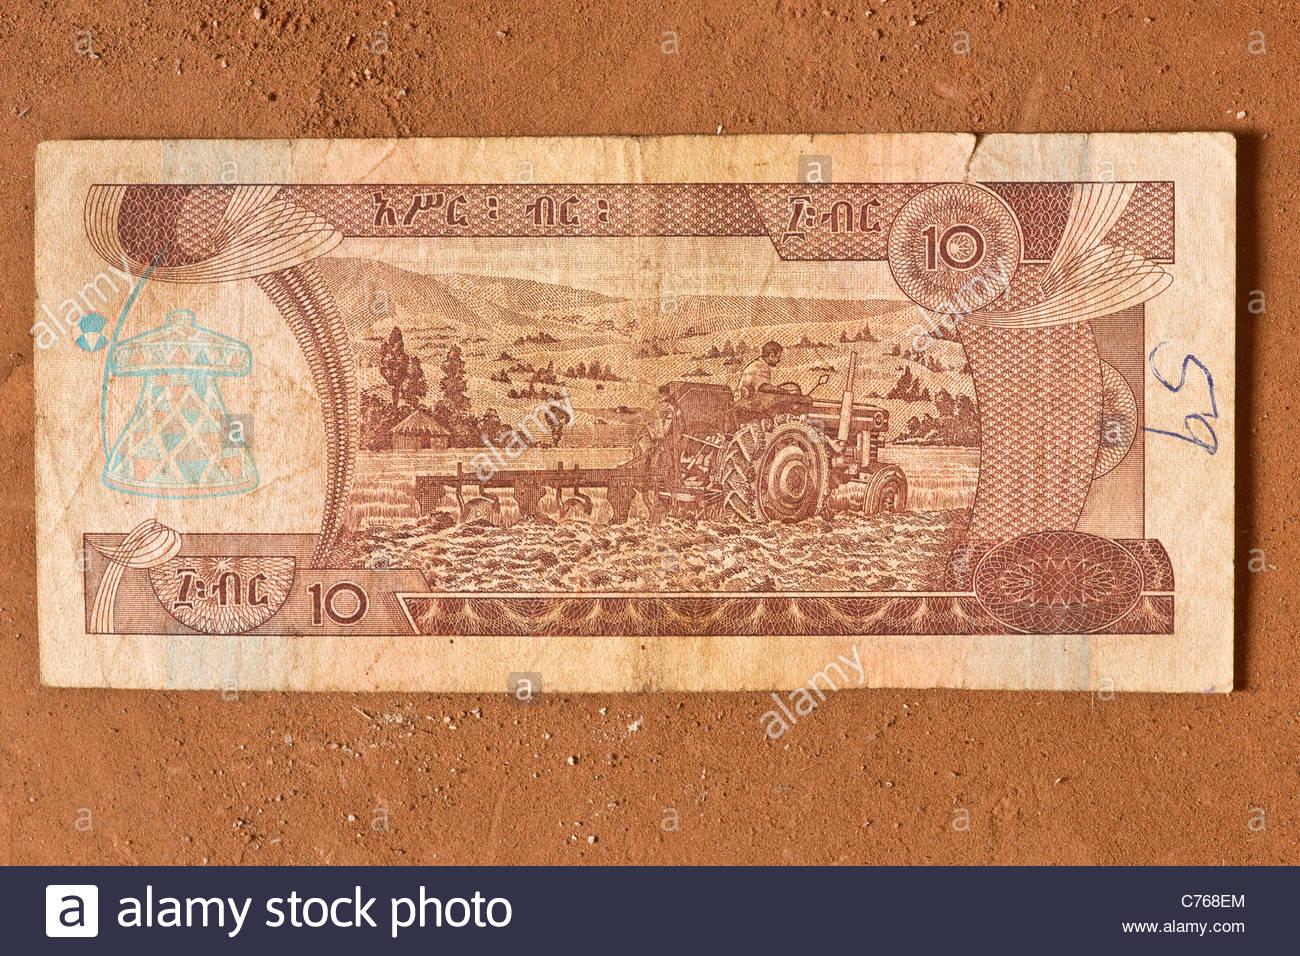 African Money Cash Banknote Ethiopian Birr Ethiopia Africa Etb